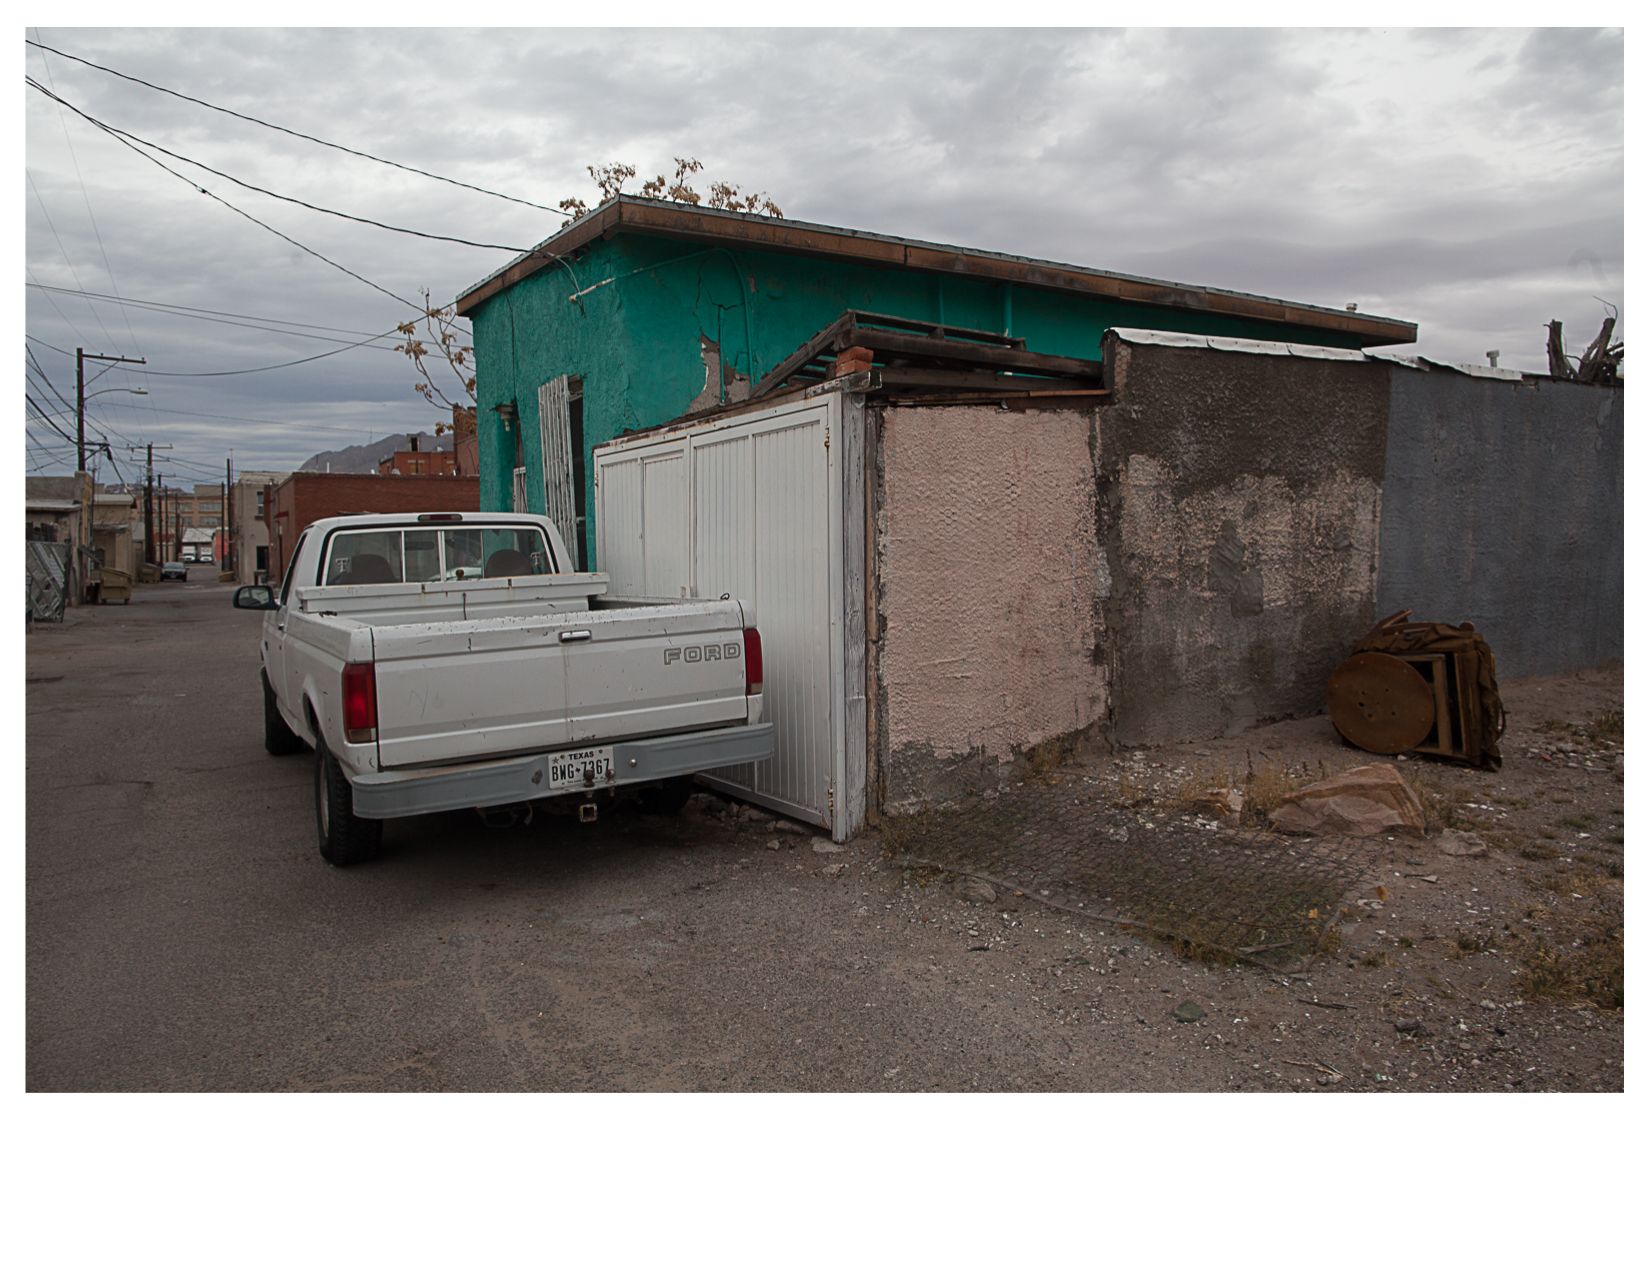 Pickup Truck and Alley, El Paso, TX.jpg